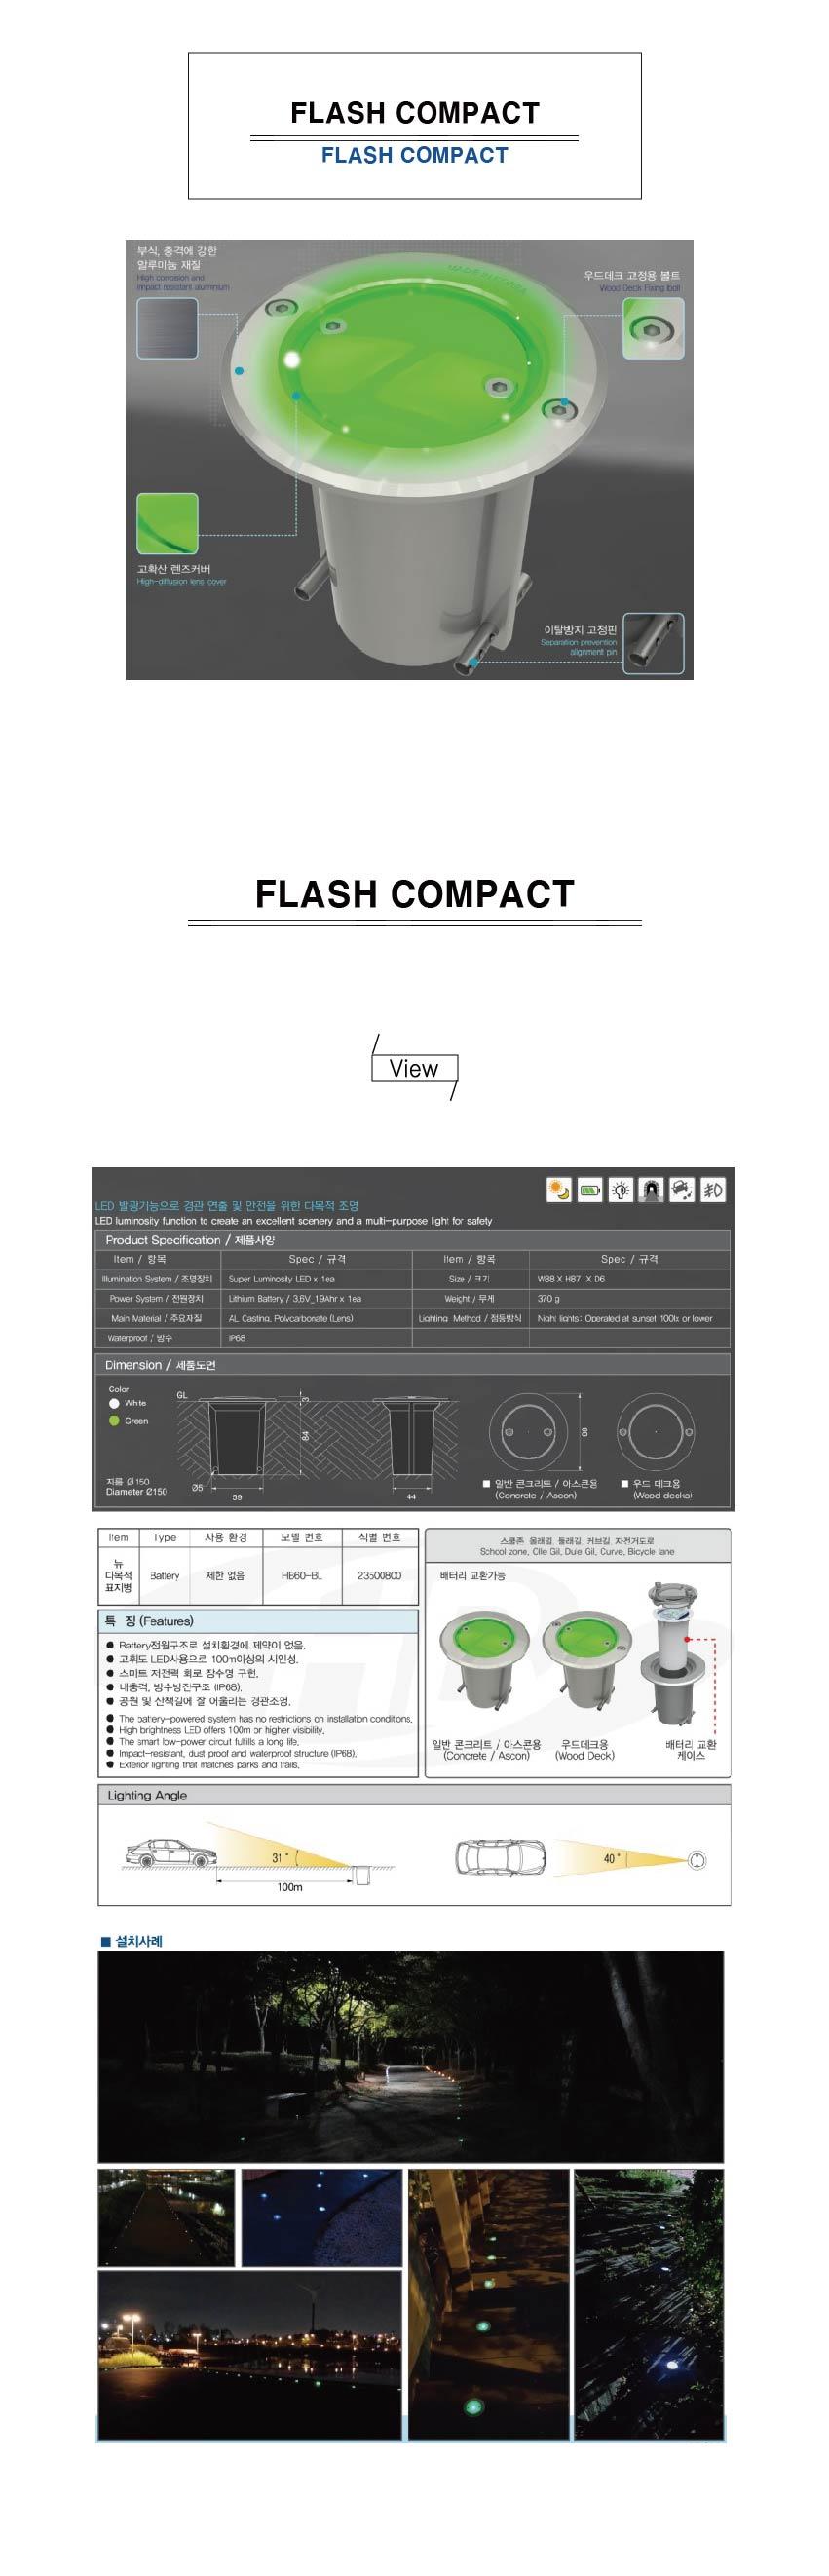 FLASH COMPACT-01.jpg